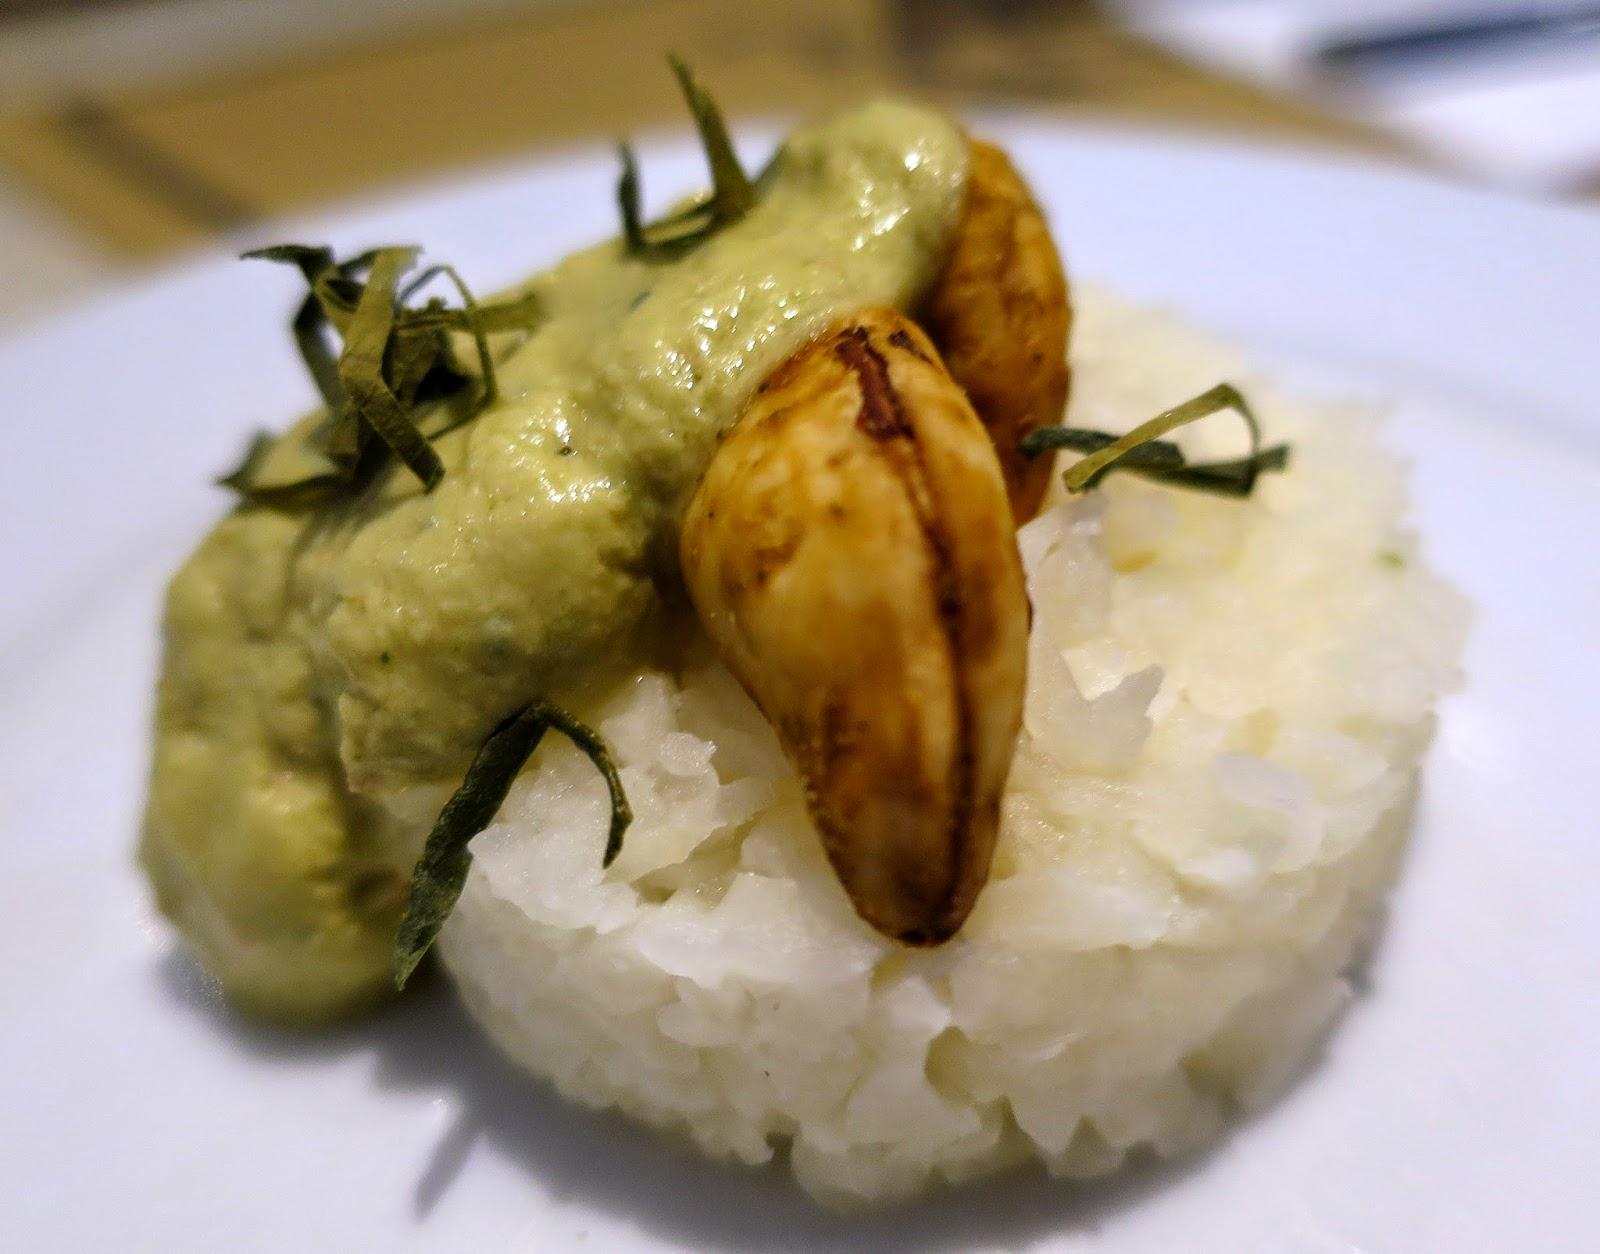 ... our sengkuang. Jicama certainly sounds far more exotic than sengkuang